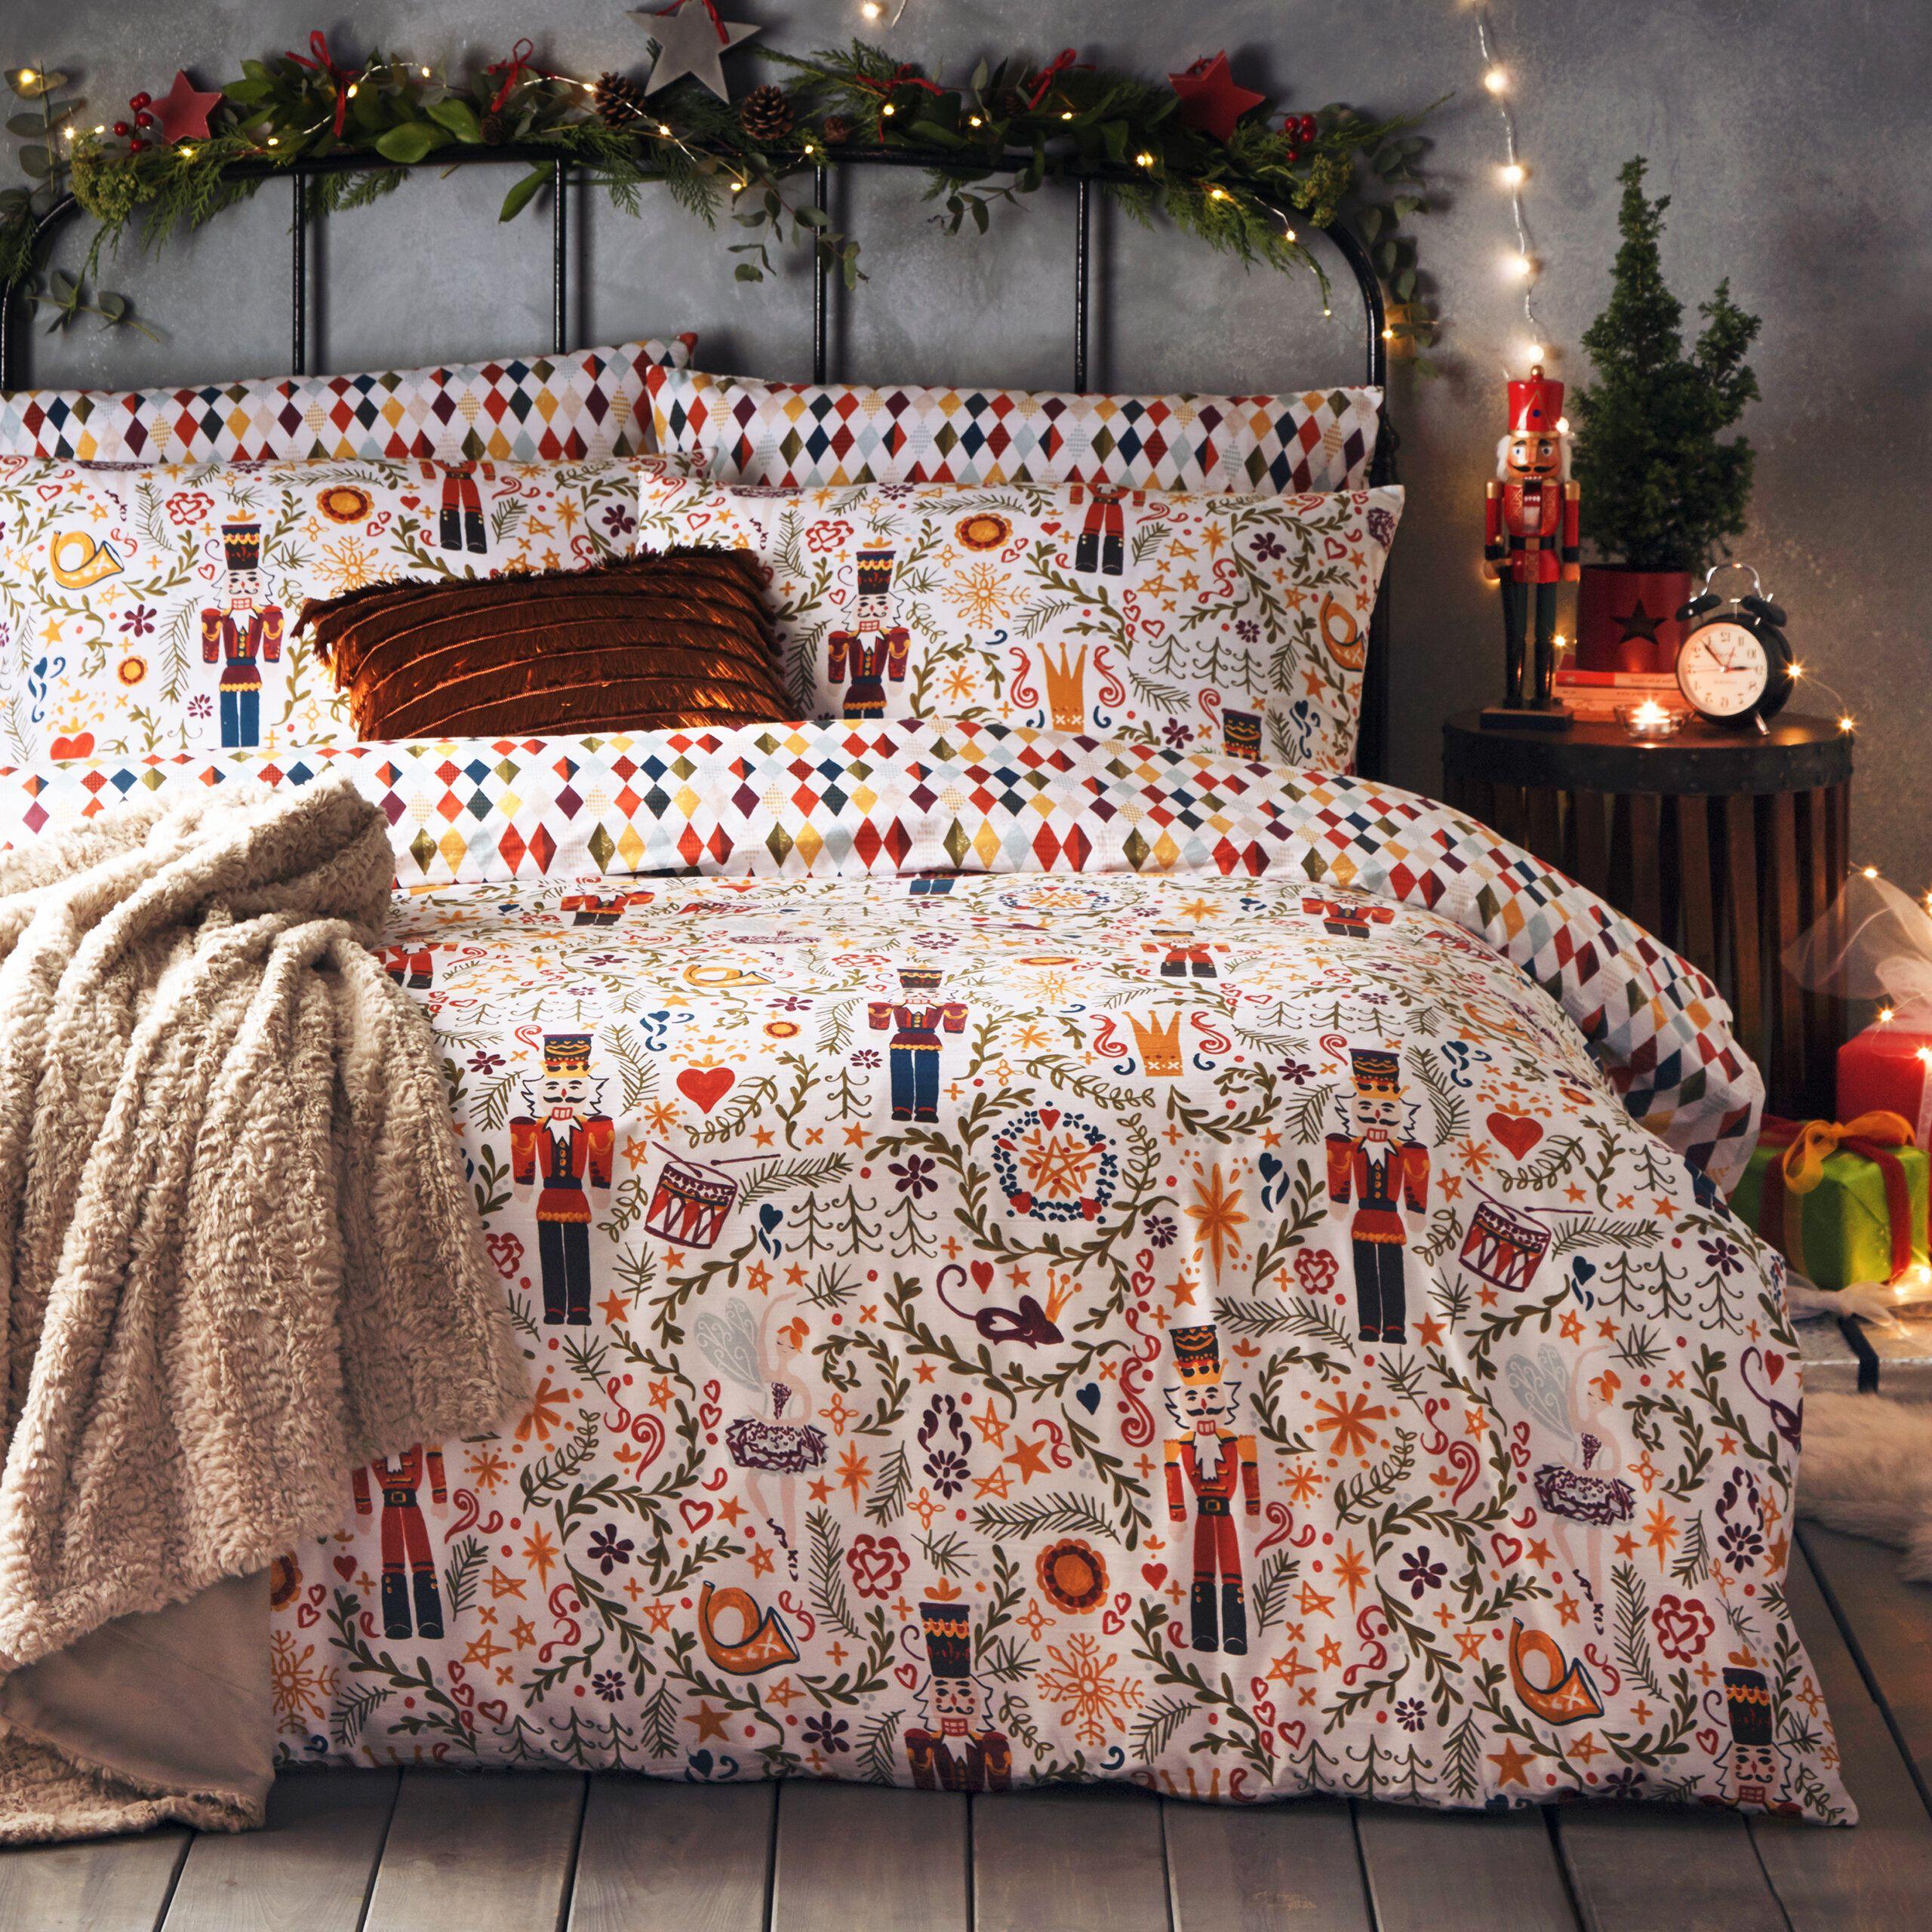 Bedroom | Duvet covers | Bedding